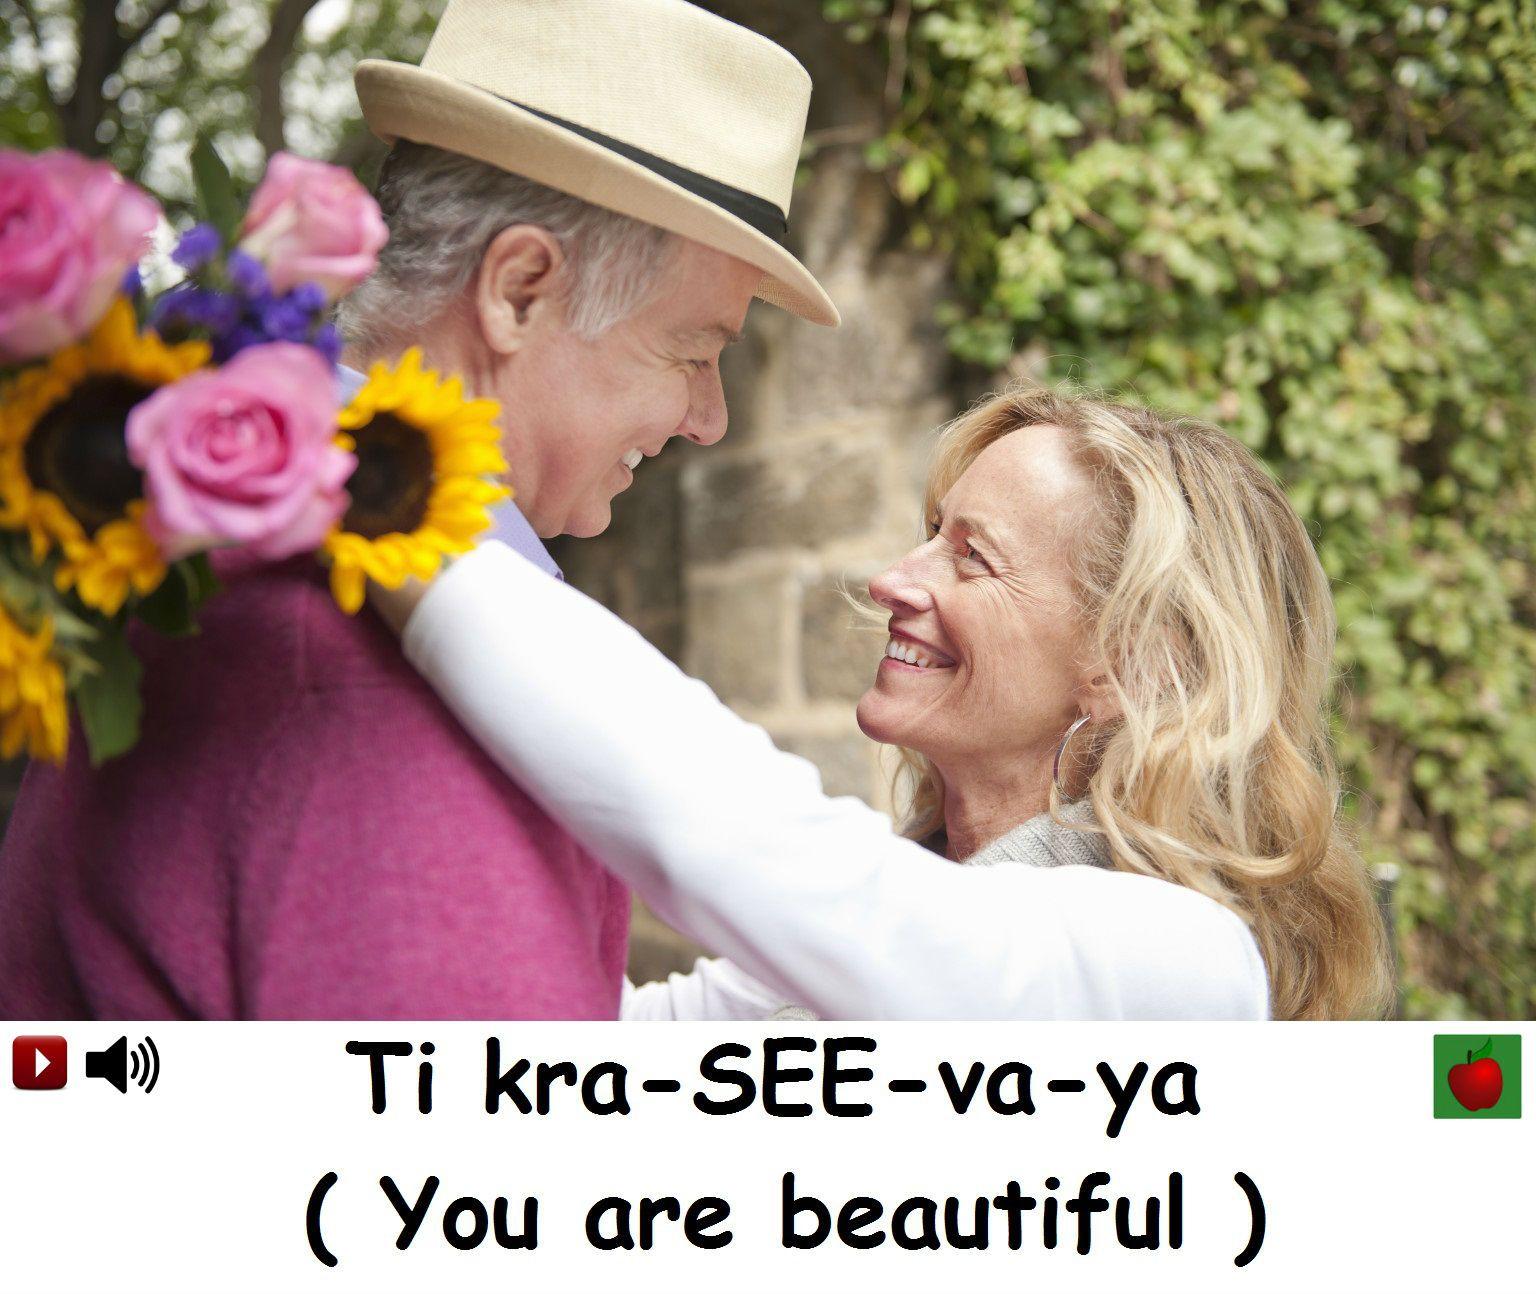 Say beautiful in russian